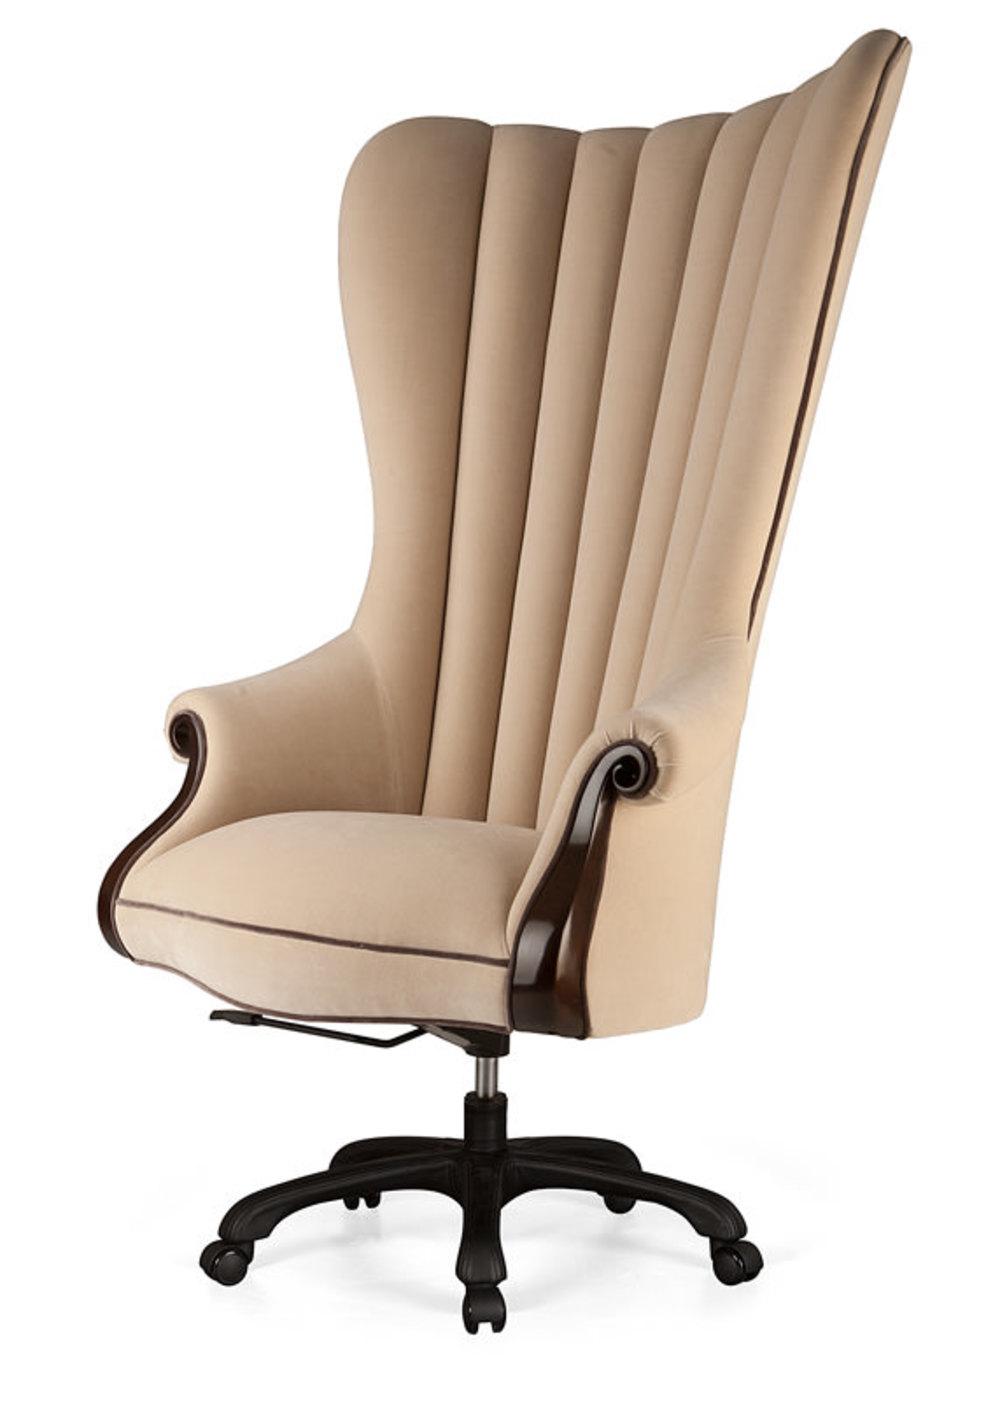 Christopher Guy - Swivel Chair